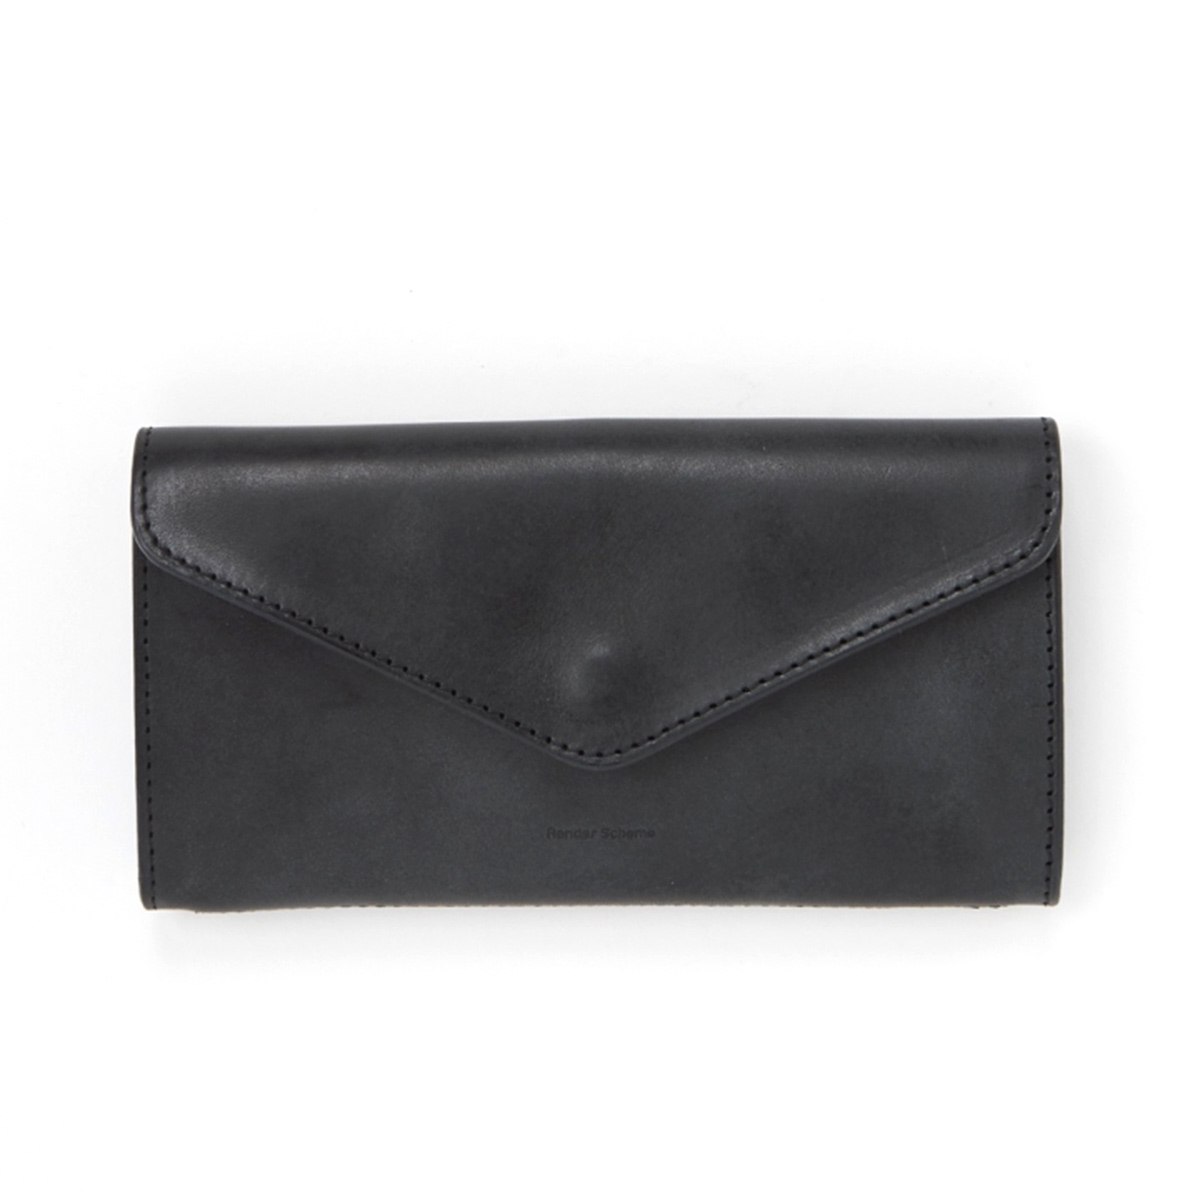 Hender Scheme / long wallet -Black